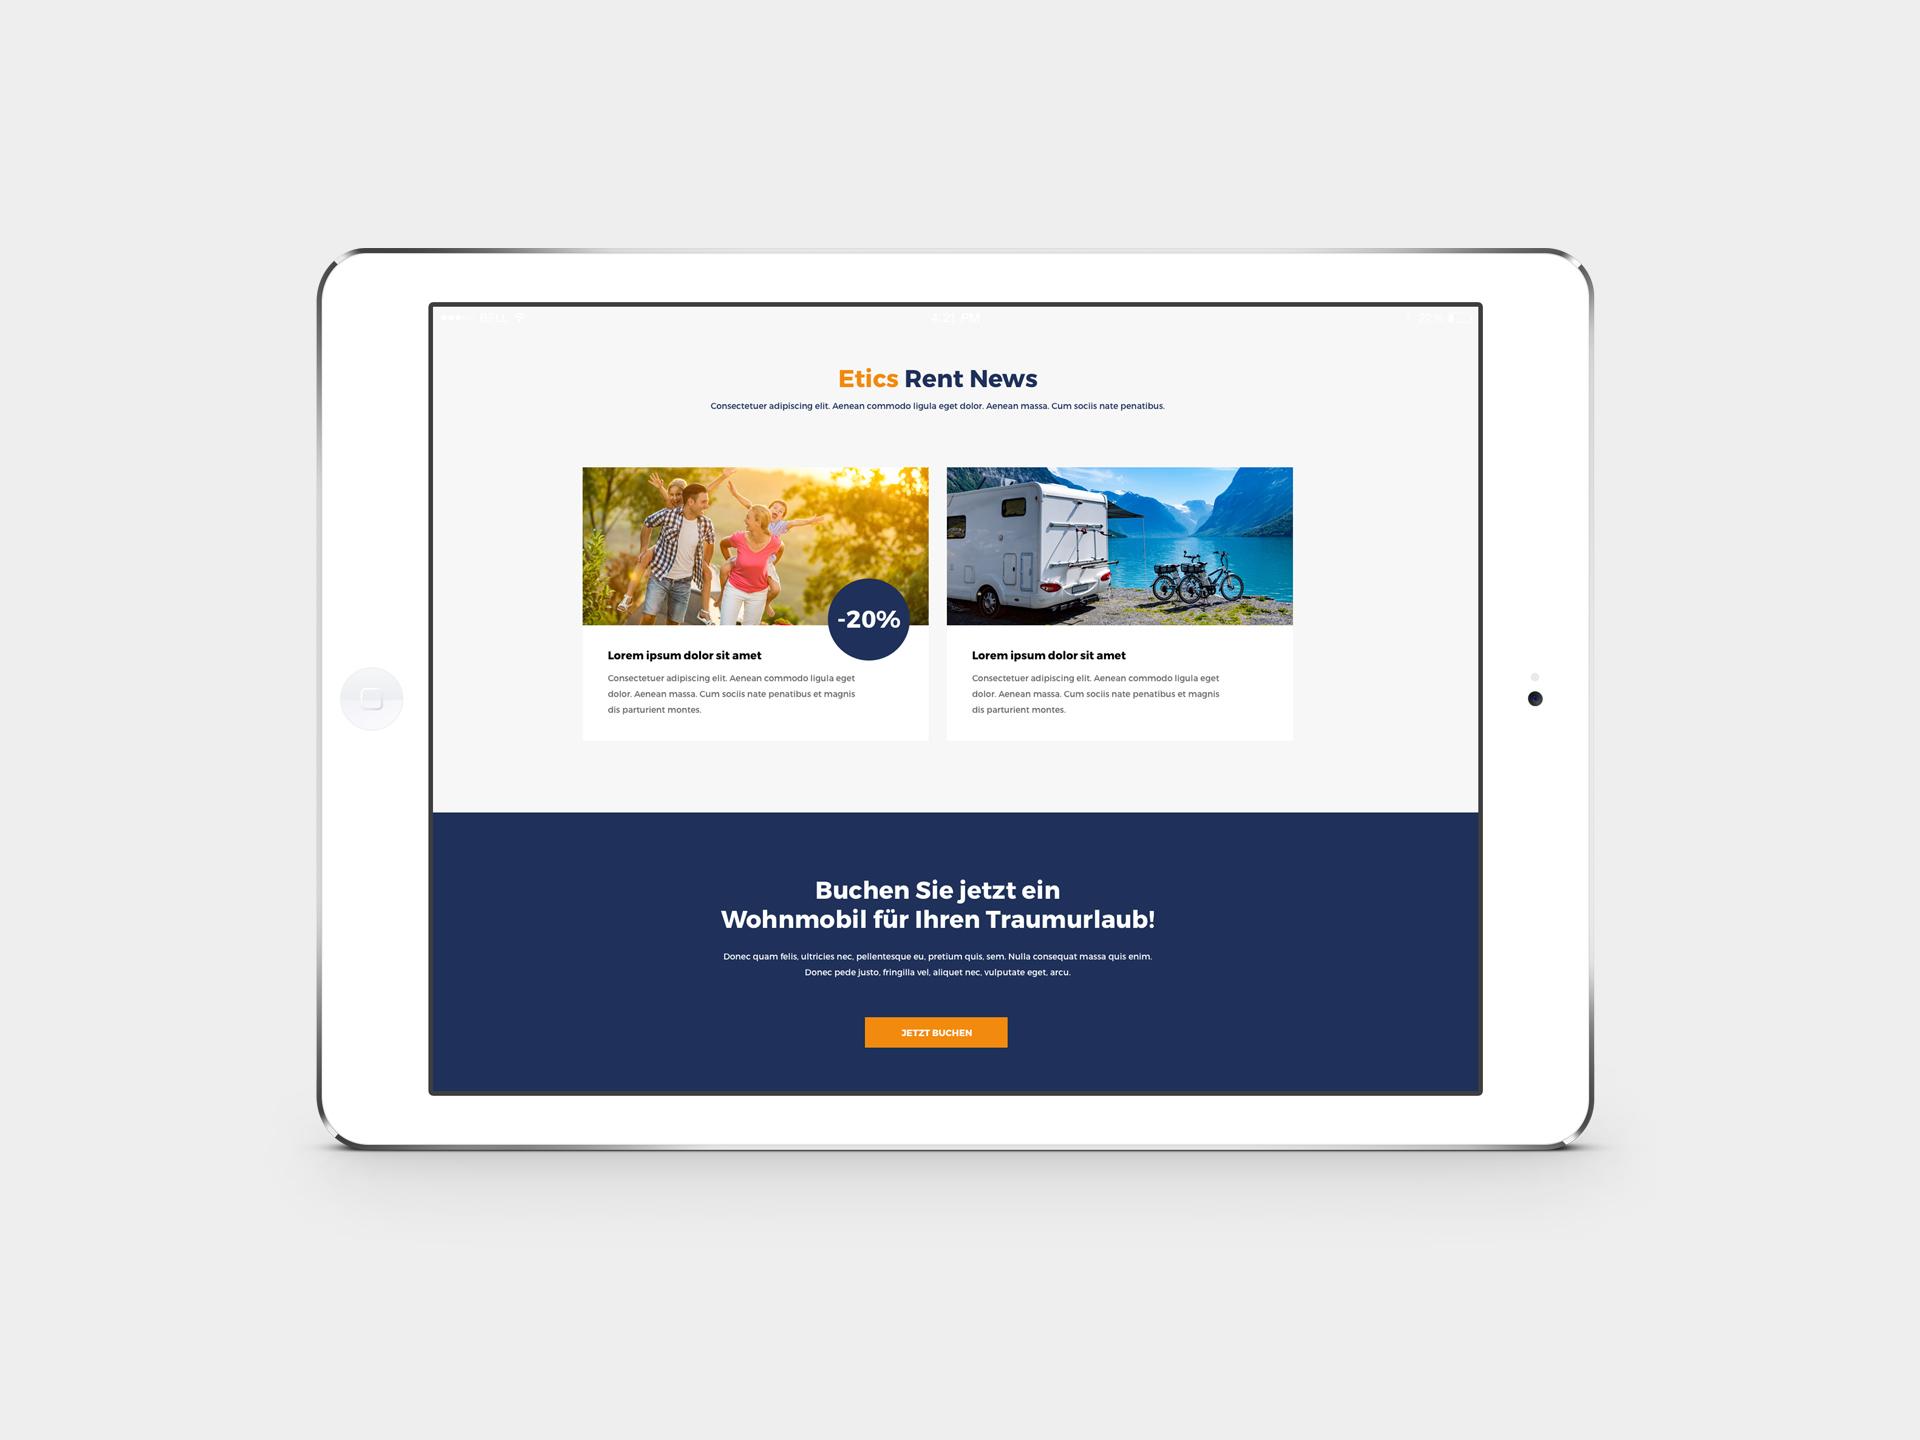 Etics Rent Mobil Website